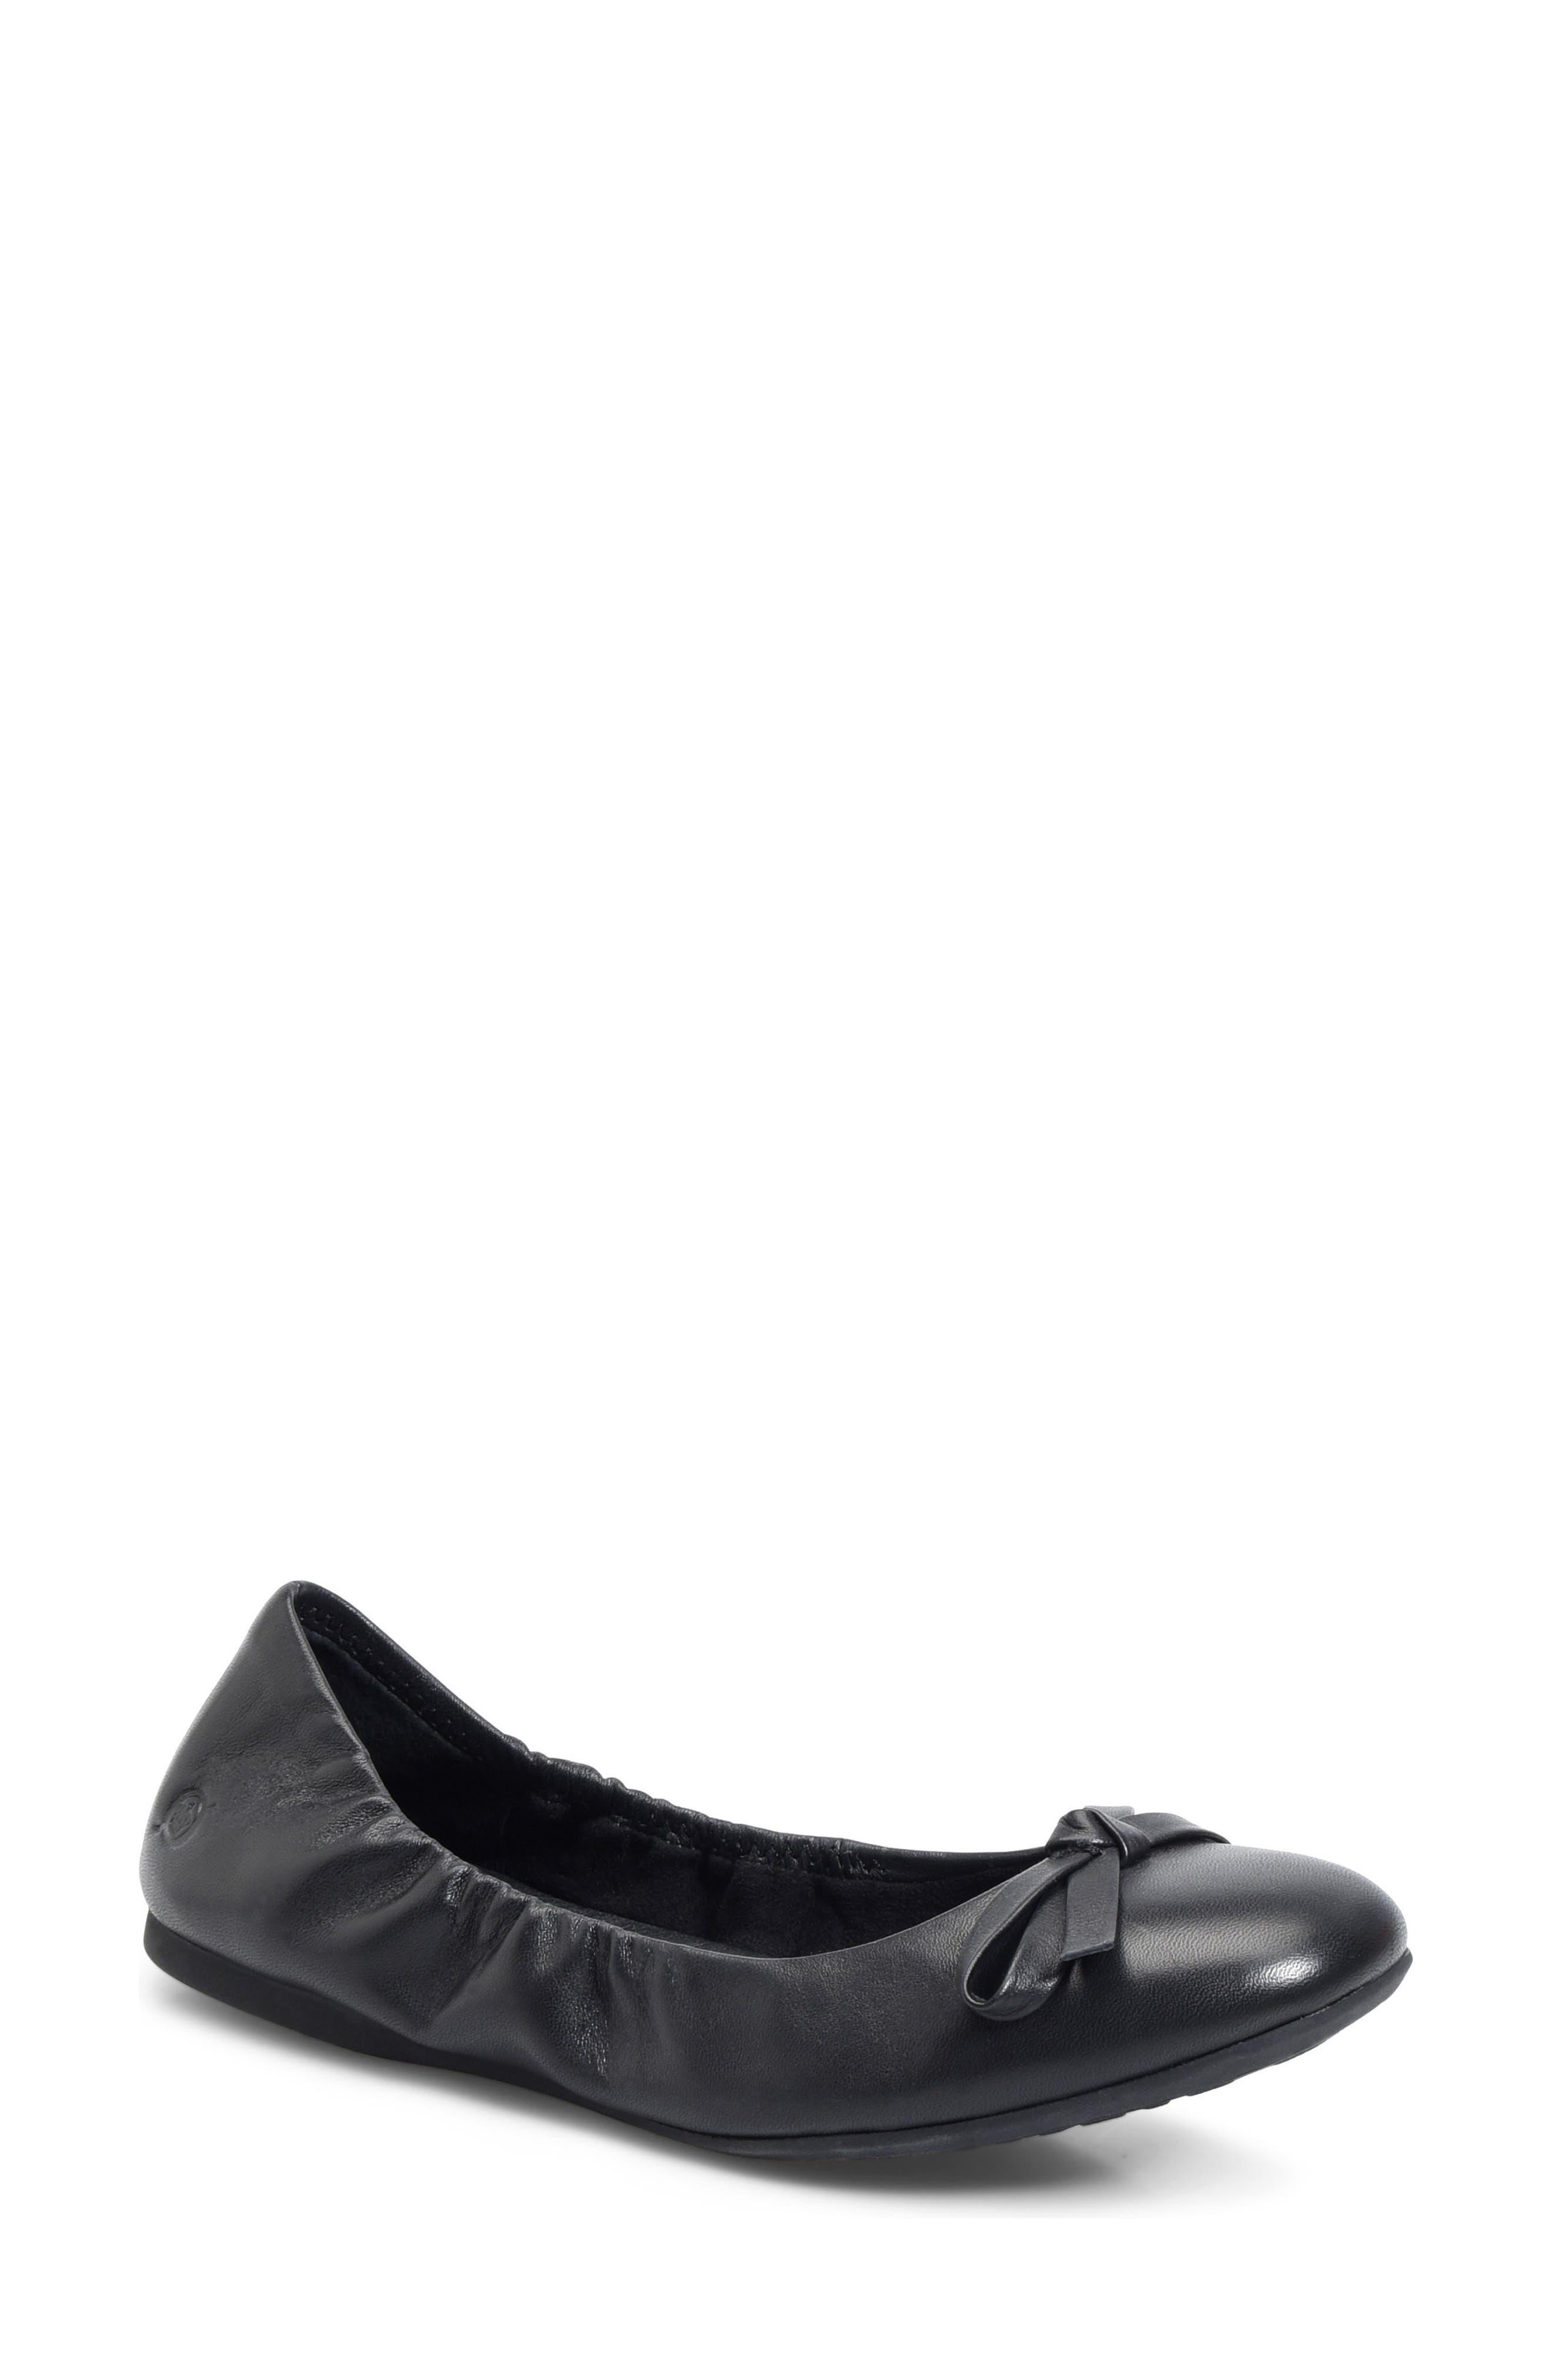 Børn Karoline Ballet Flat (Women)